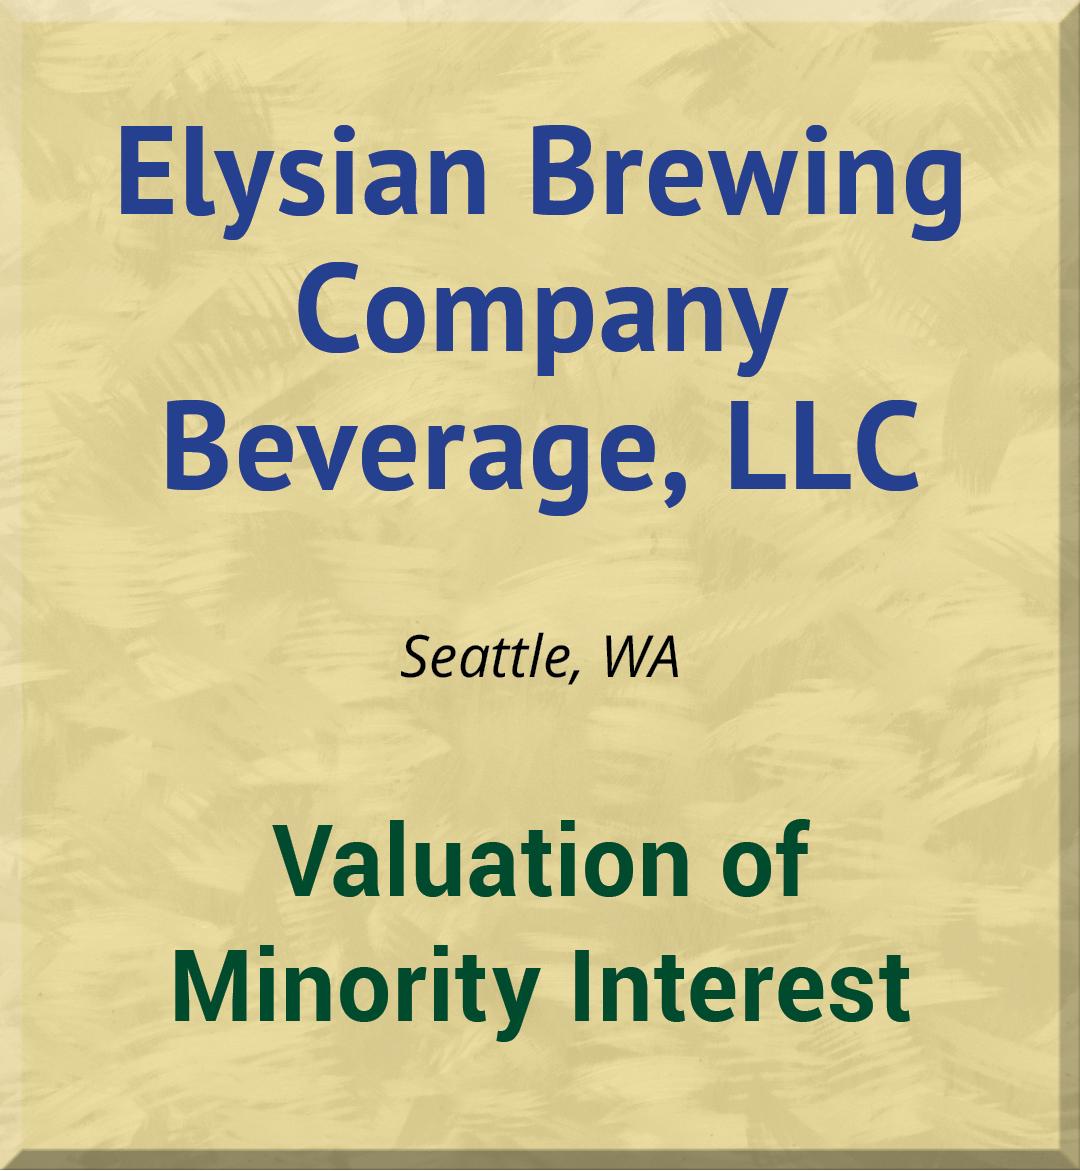 Elysian Brewing Company Beverage, LLC